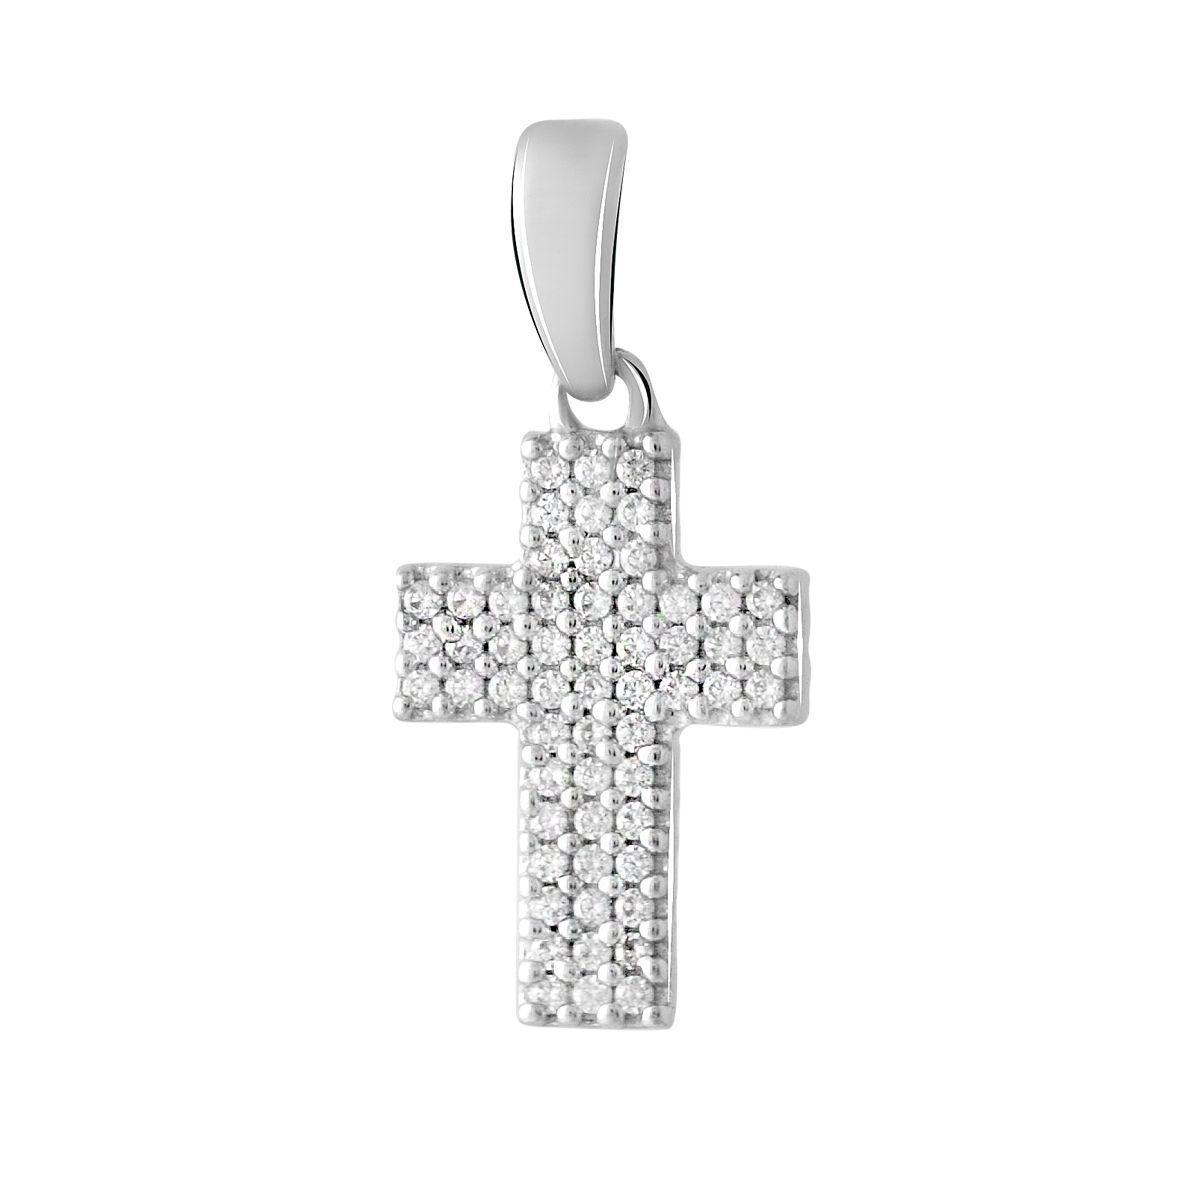 Серебряный крестик DreamJewelry с фианитами (2064848)